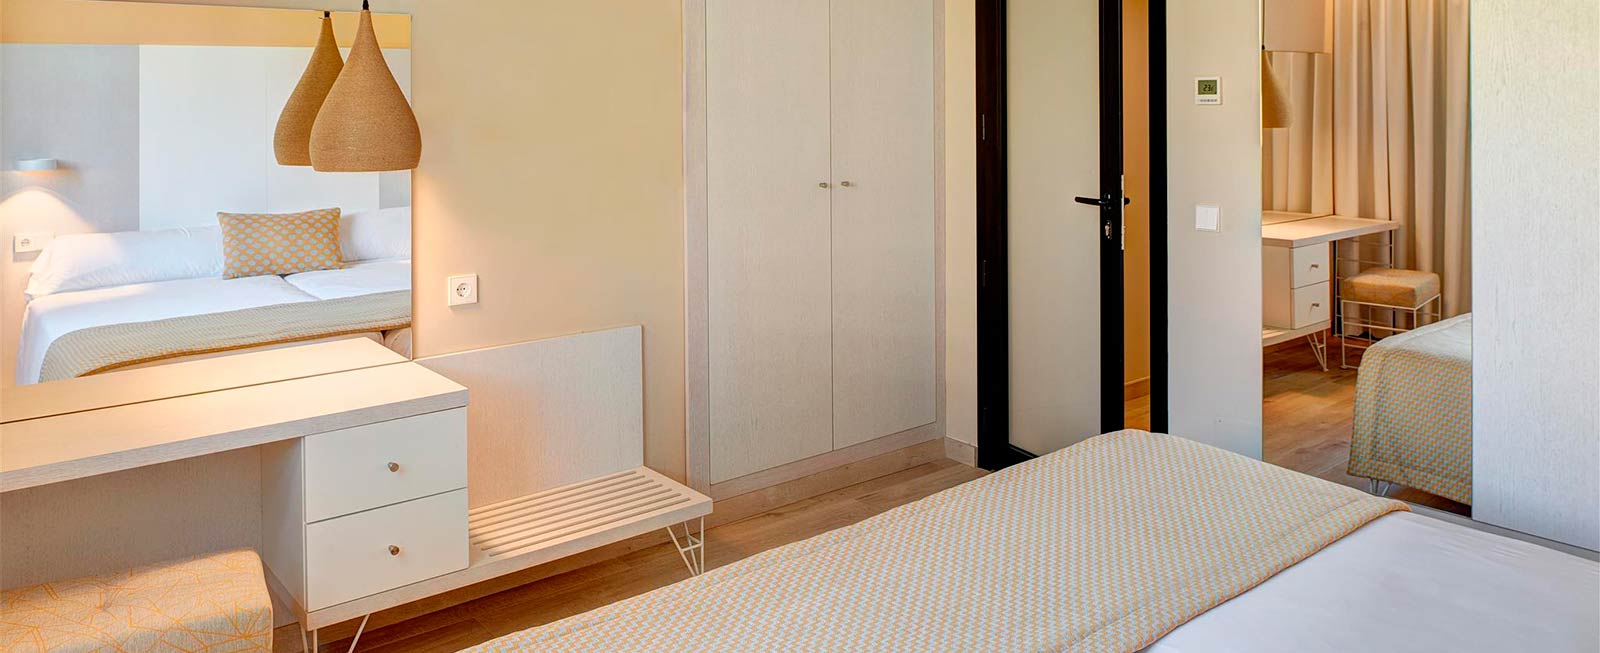 Apartamento Select Protur Vista Badia Aparthotel